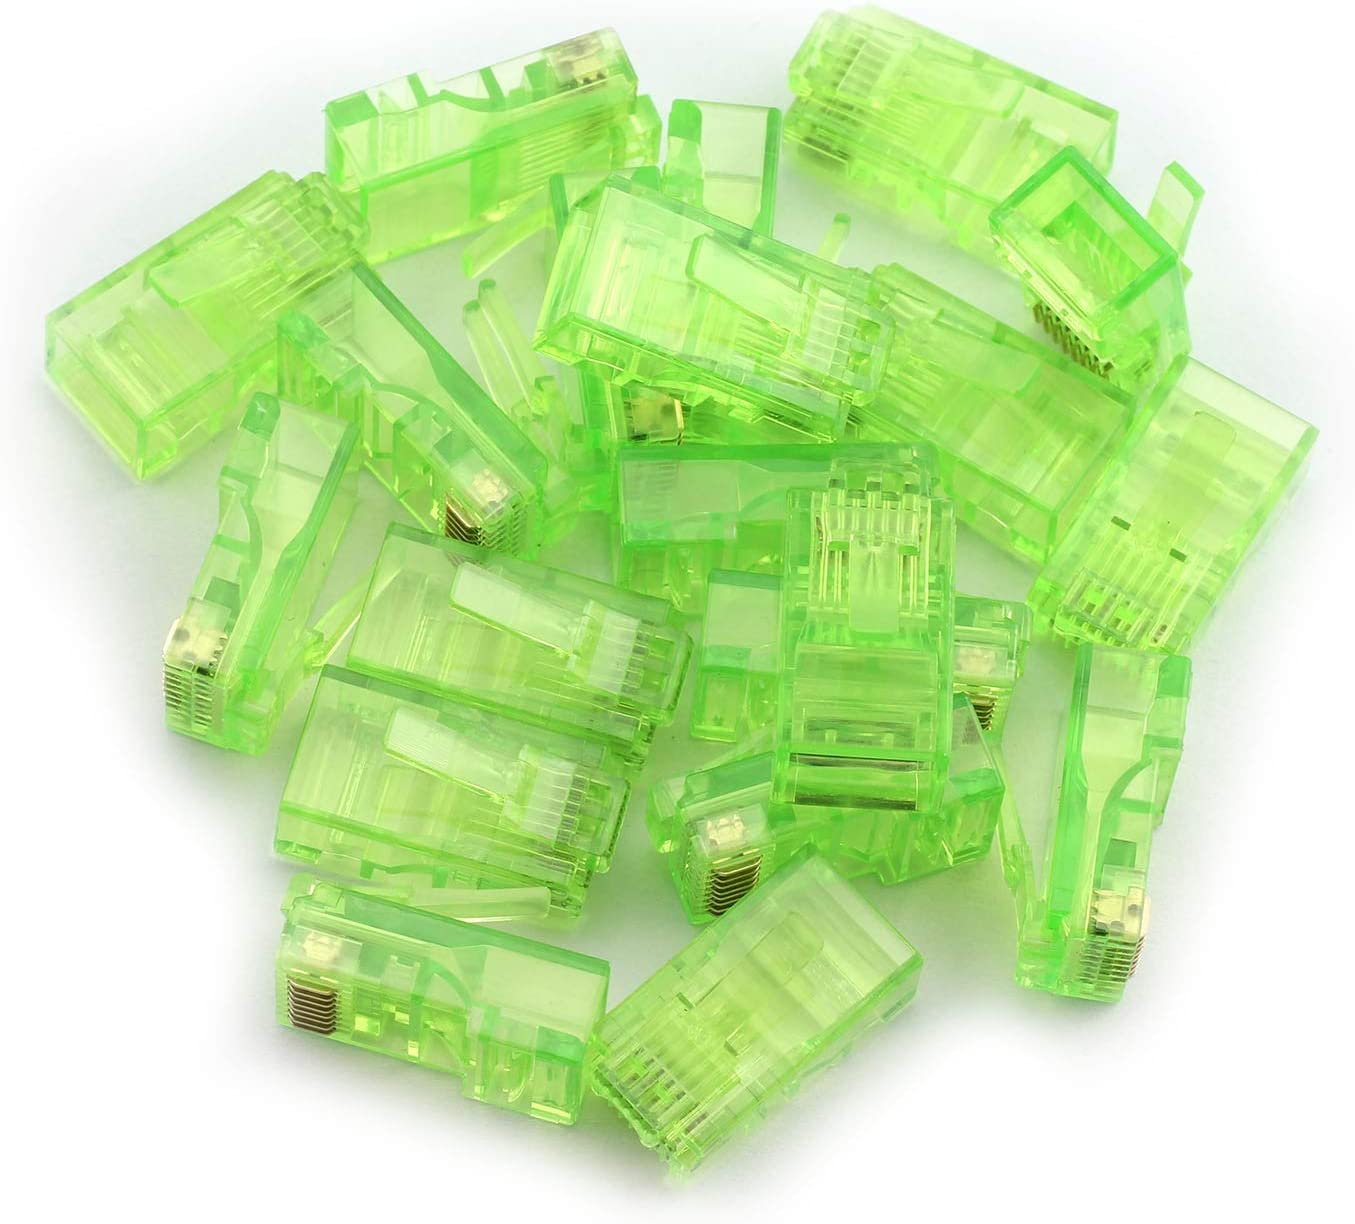 Tegg 20PCS RJ45 8P8C Modular Plug LAN Network RJ-45 Ethernet Cables Unshielded Cat5 CAT5e Connector Adapter Green Color